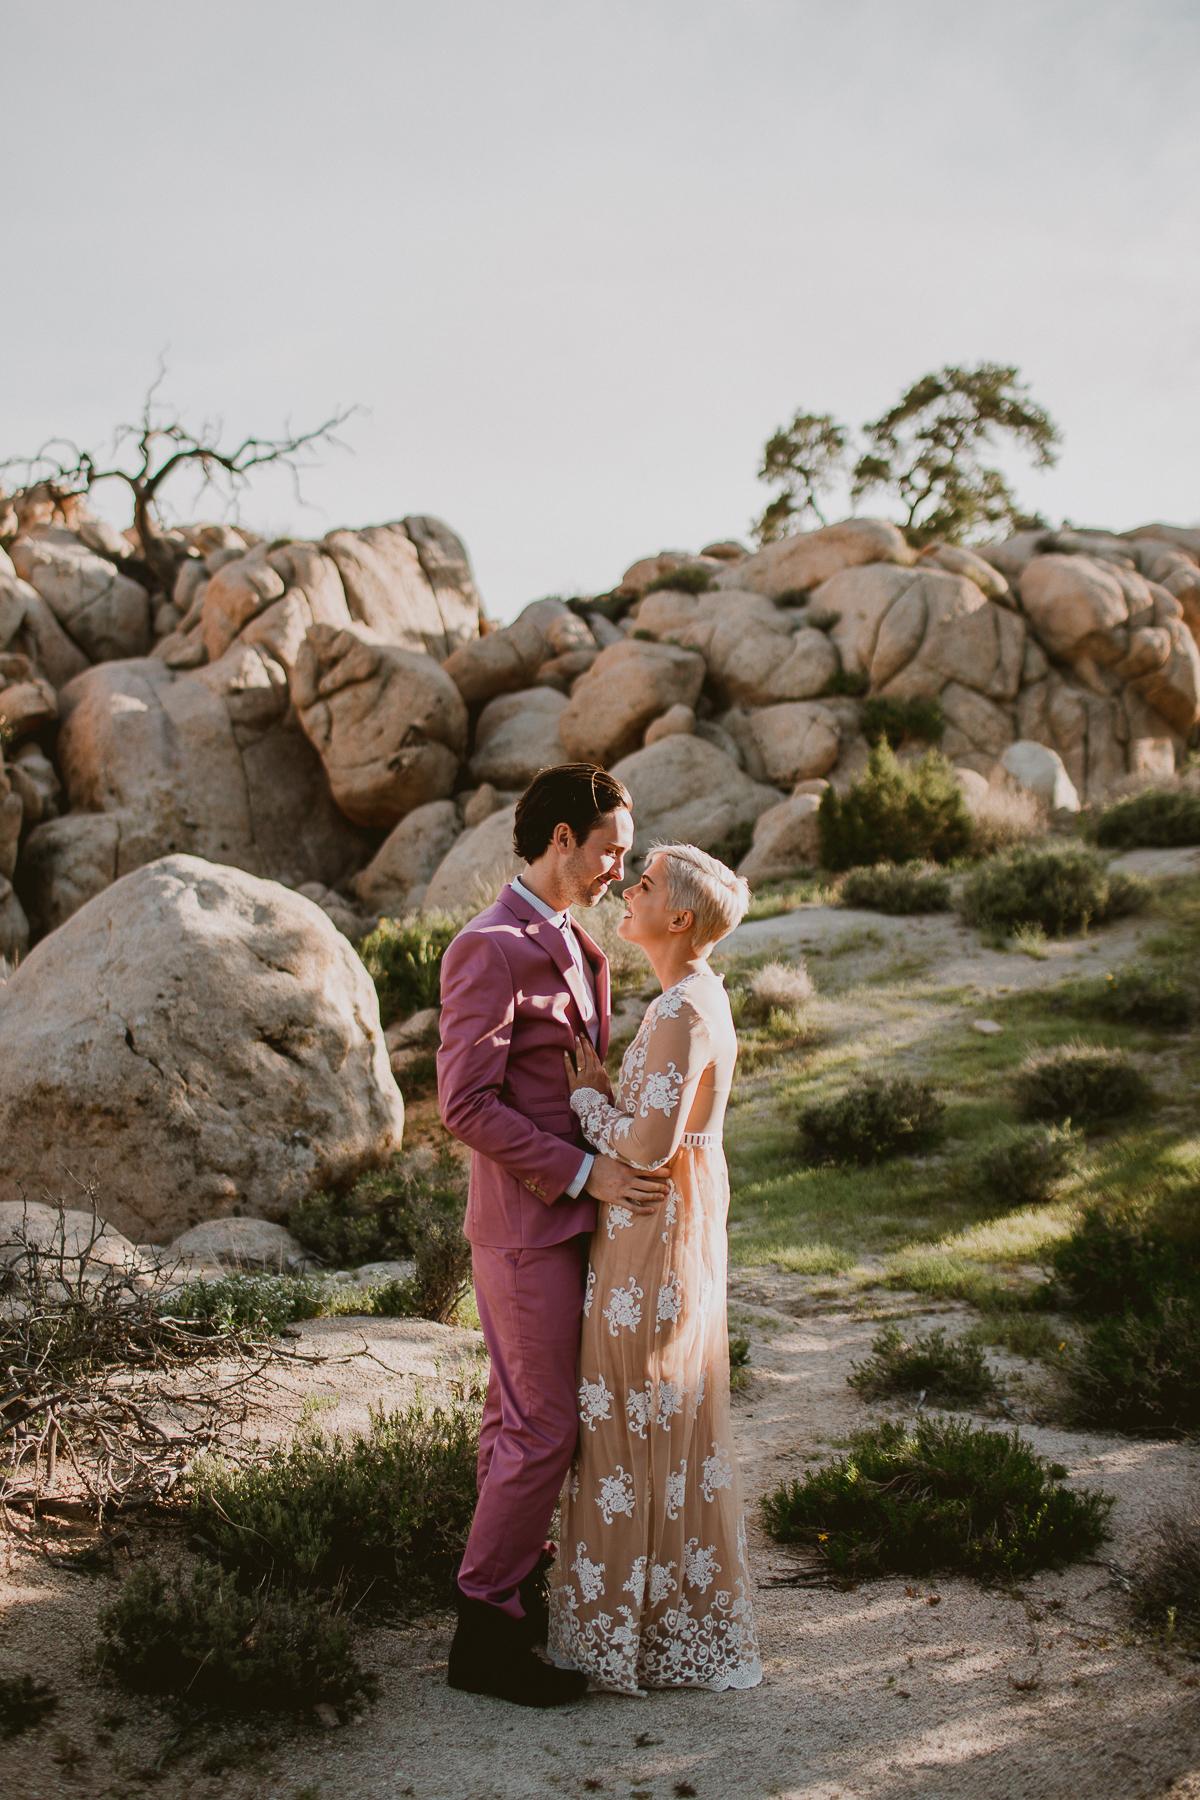 joshua-tree-national-park-engagement-kelley-raye-los-angeles-wedding-photographer-53.jpg